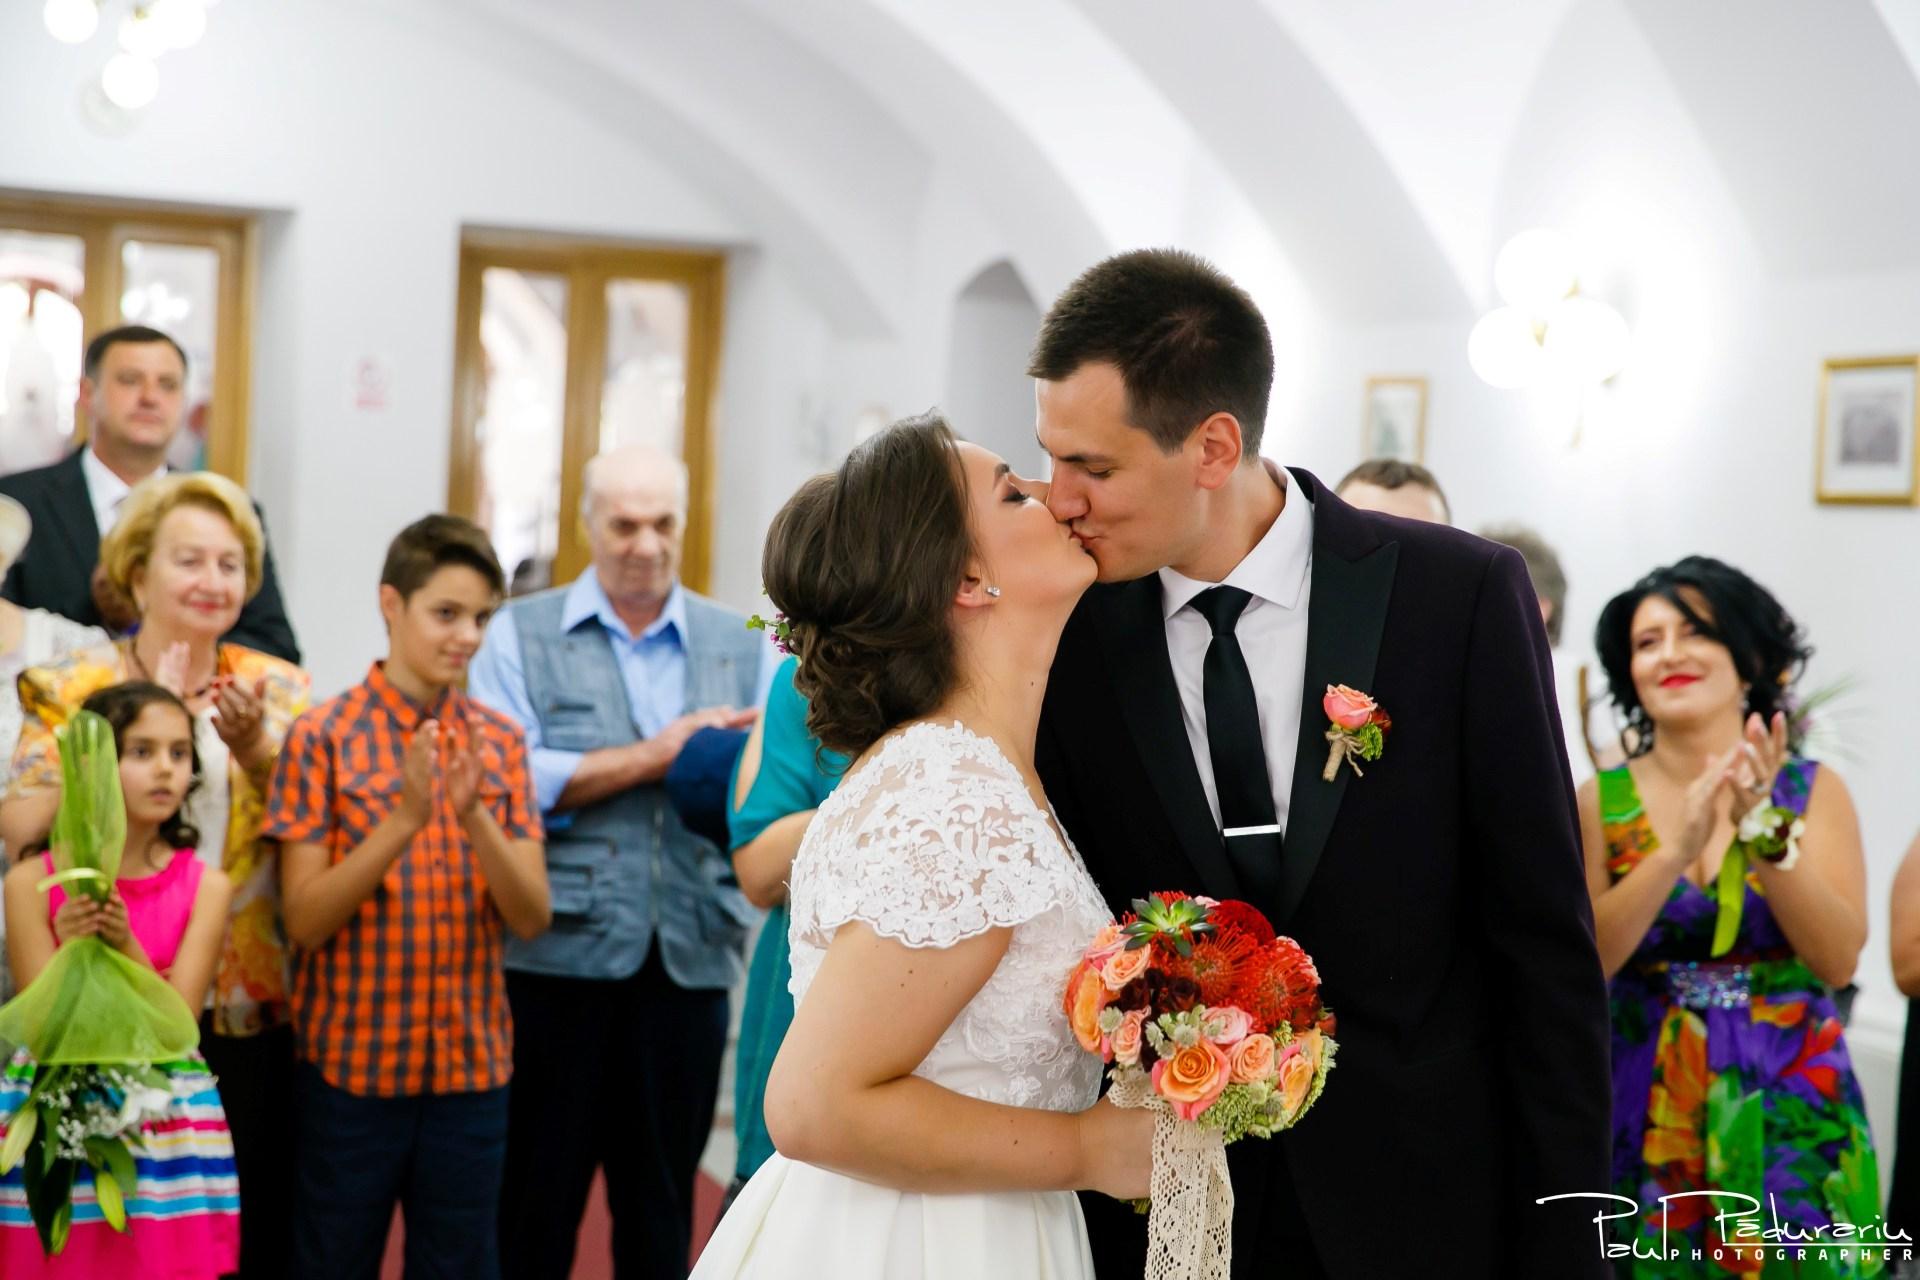 Cristina si Razvan nunta rustica la Bellaria Iasi cununia civila sarut miri fotograf profesionist nunta www.paulpadurariu.ro © 2017 Paul Padurariu